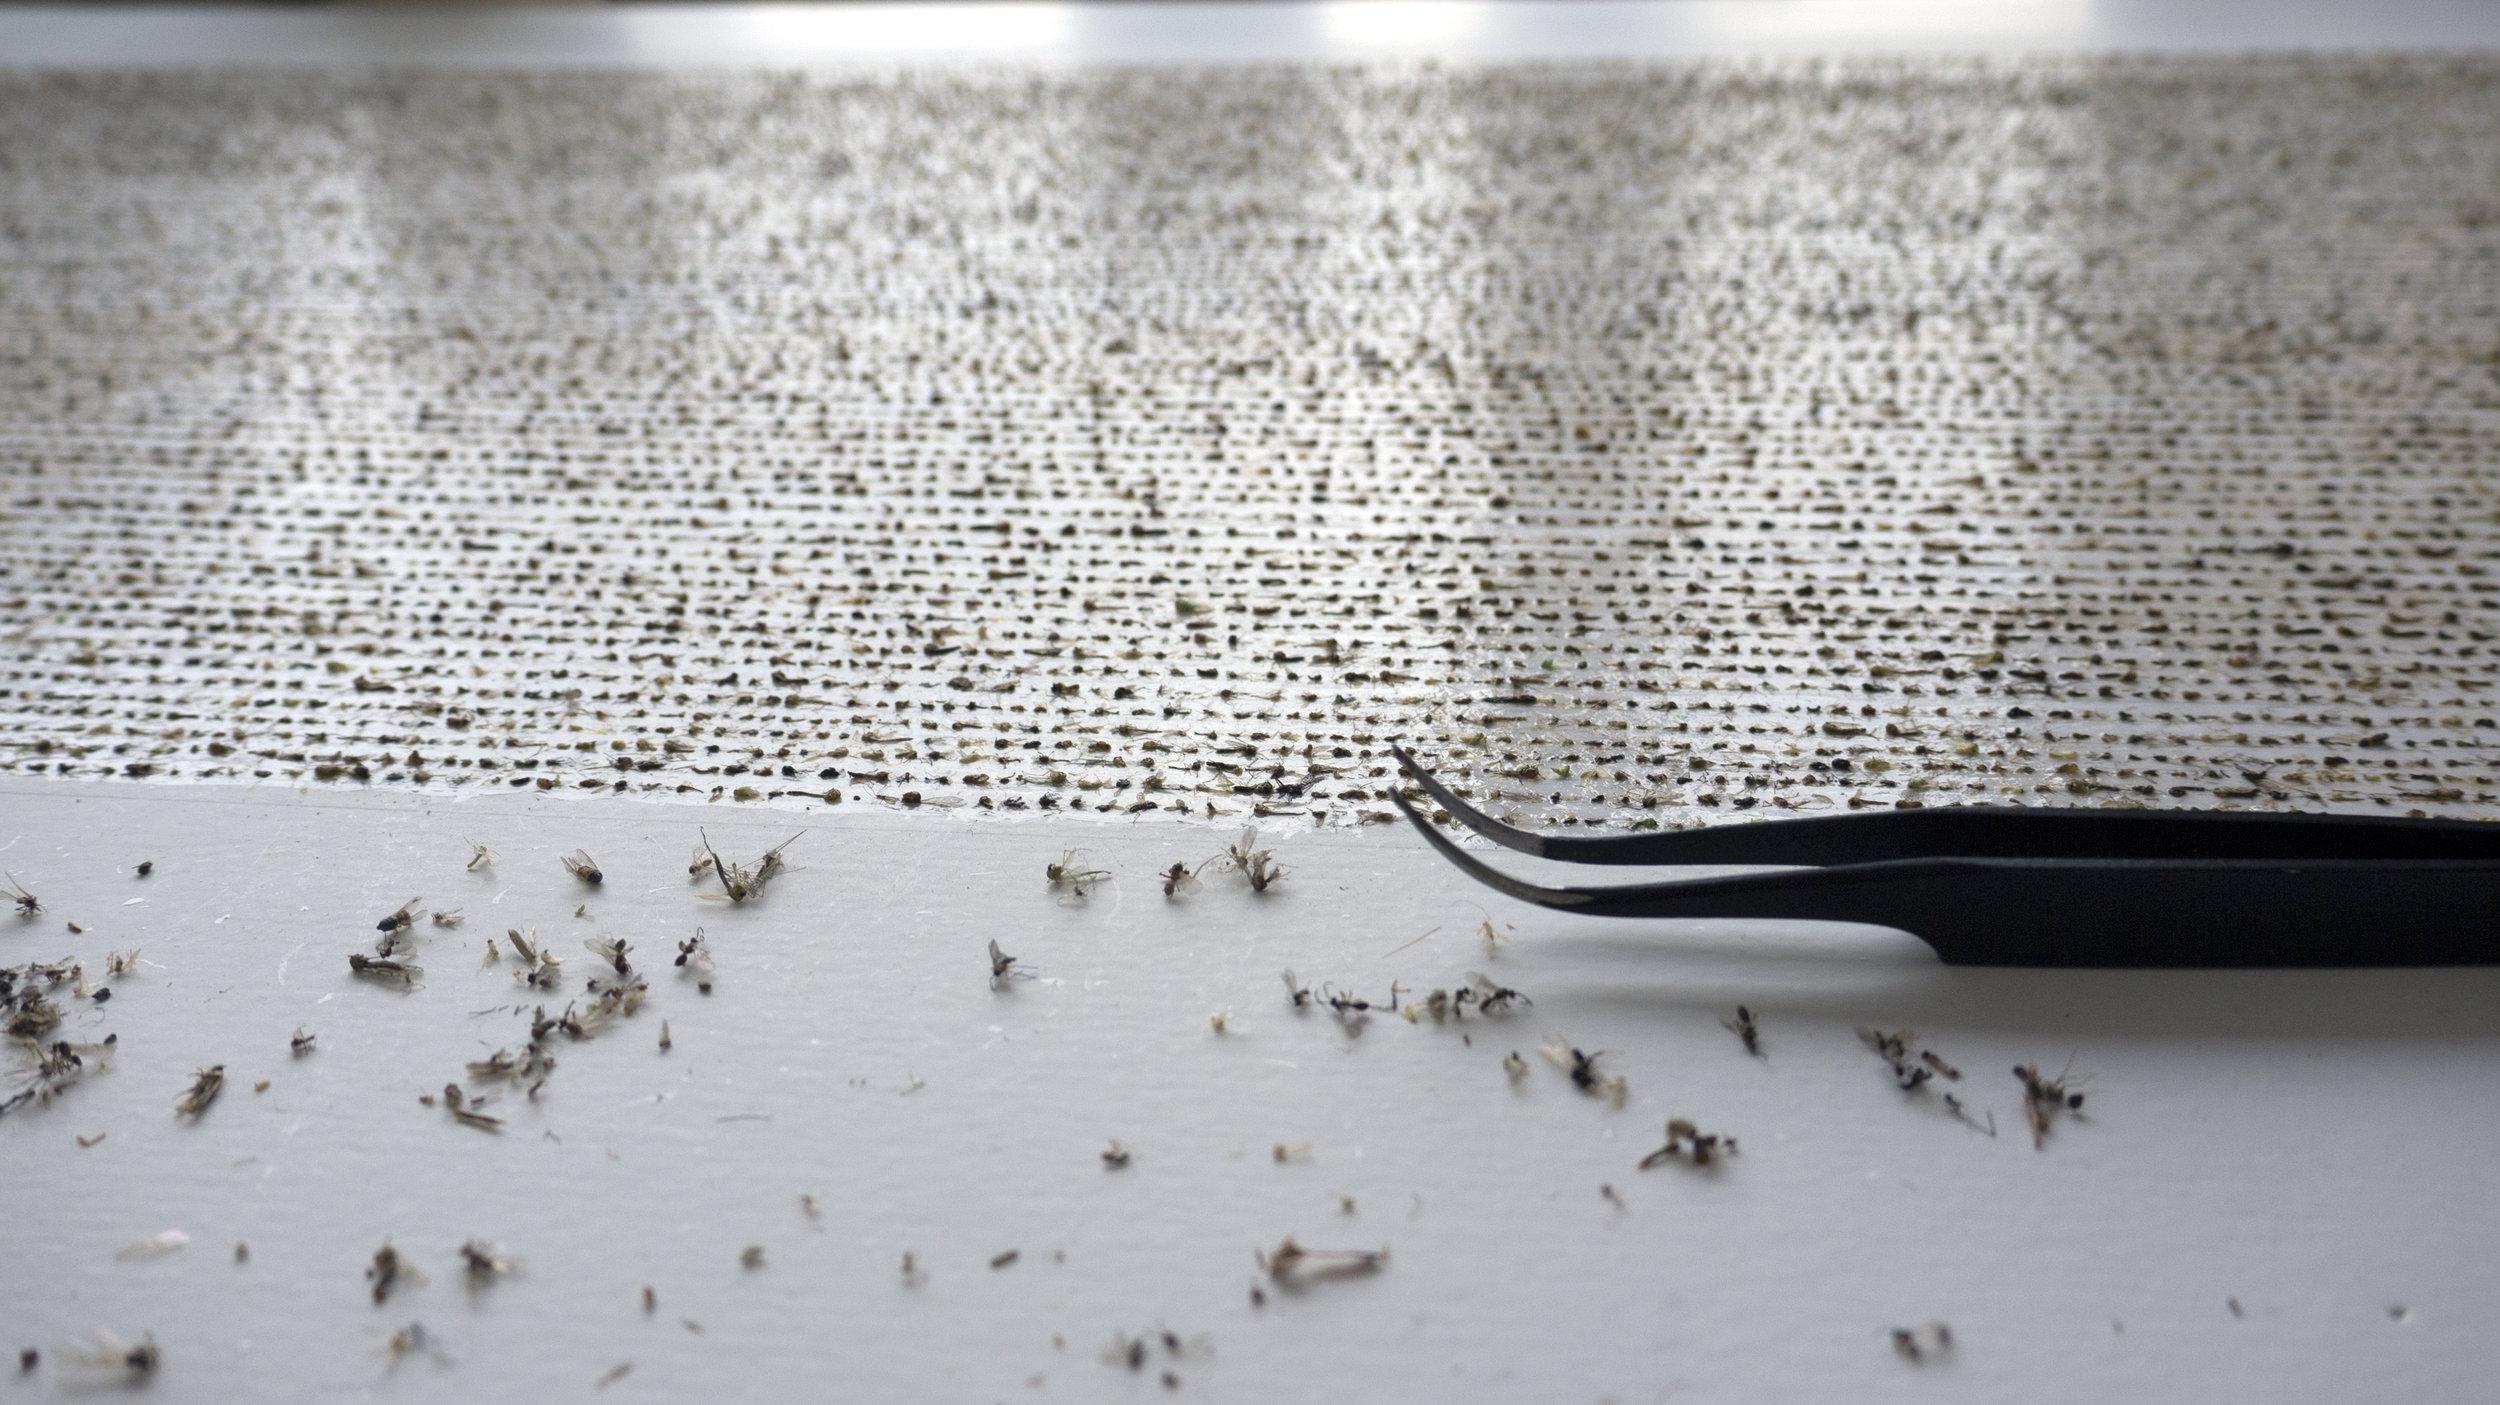 Nam Hoon Kim, 18911 Enumerate death, various types of flies on board, 205 adhesive, 89 x 51 cm, 2017, Courtesy of Artist